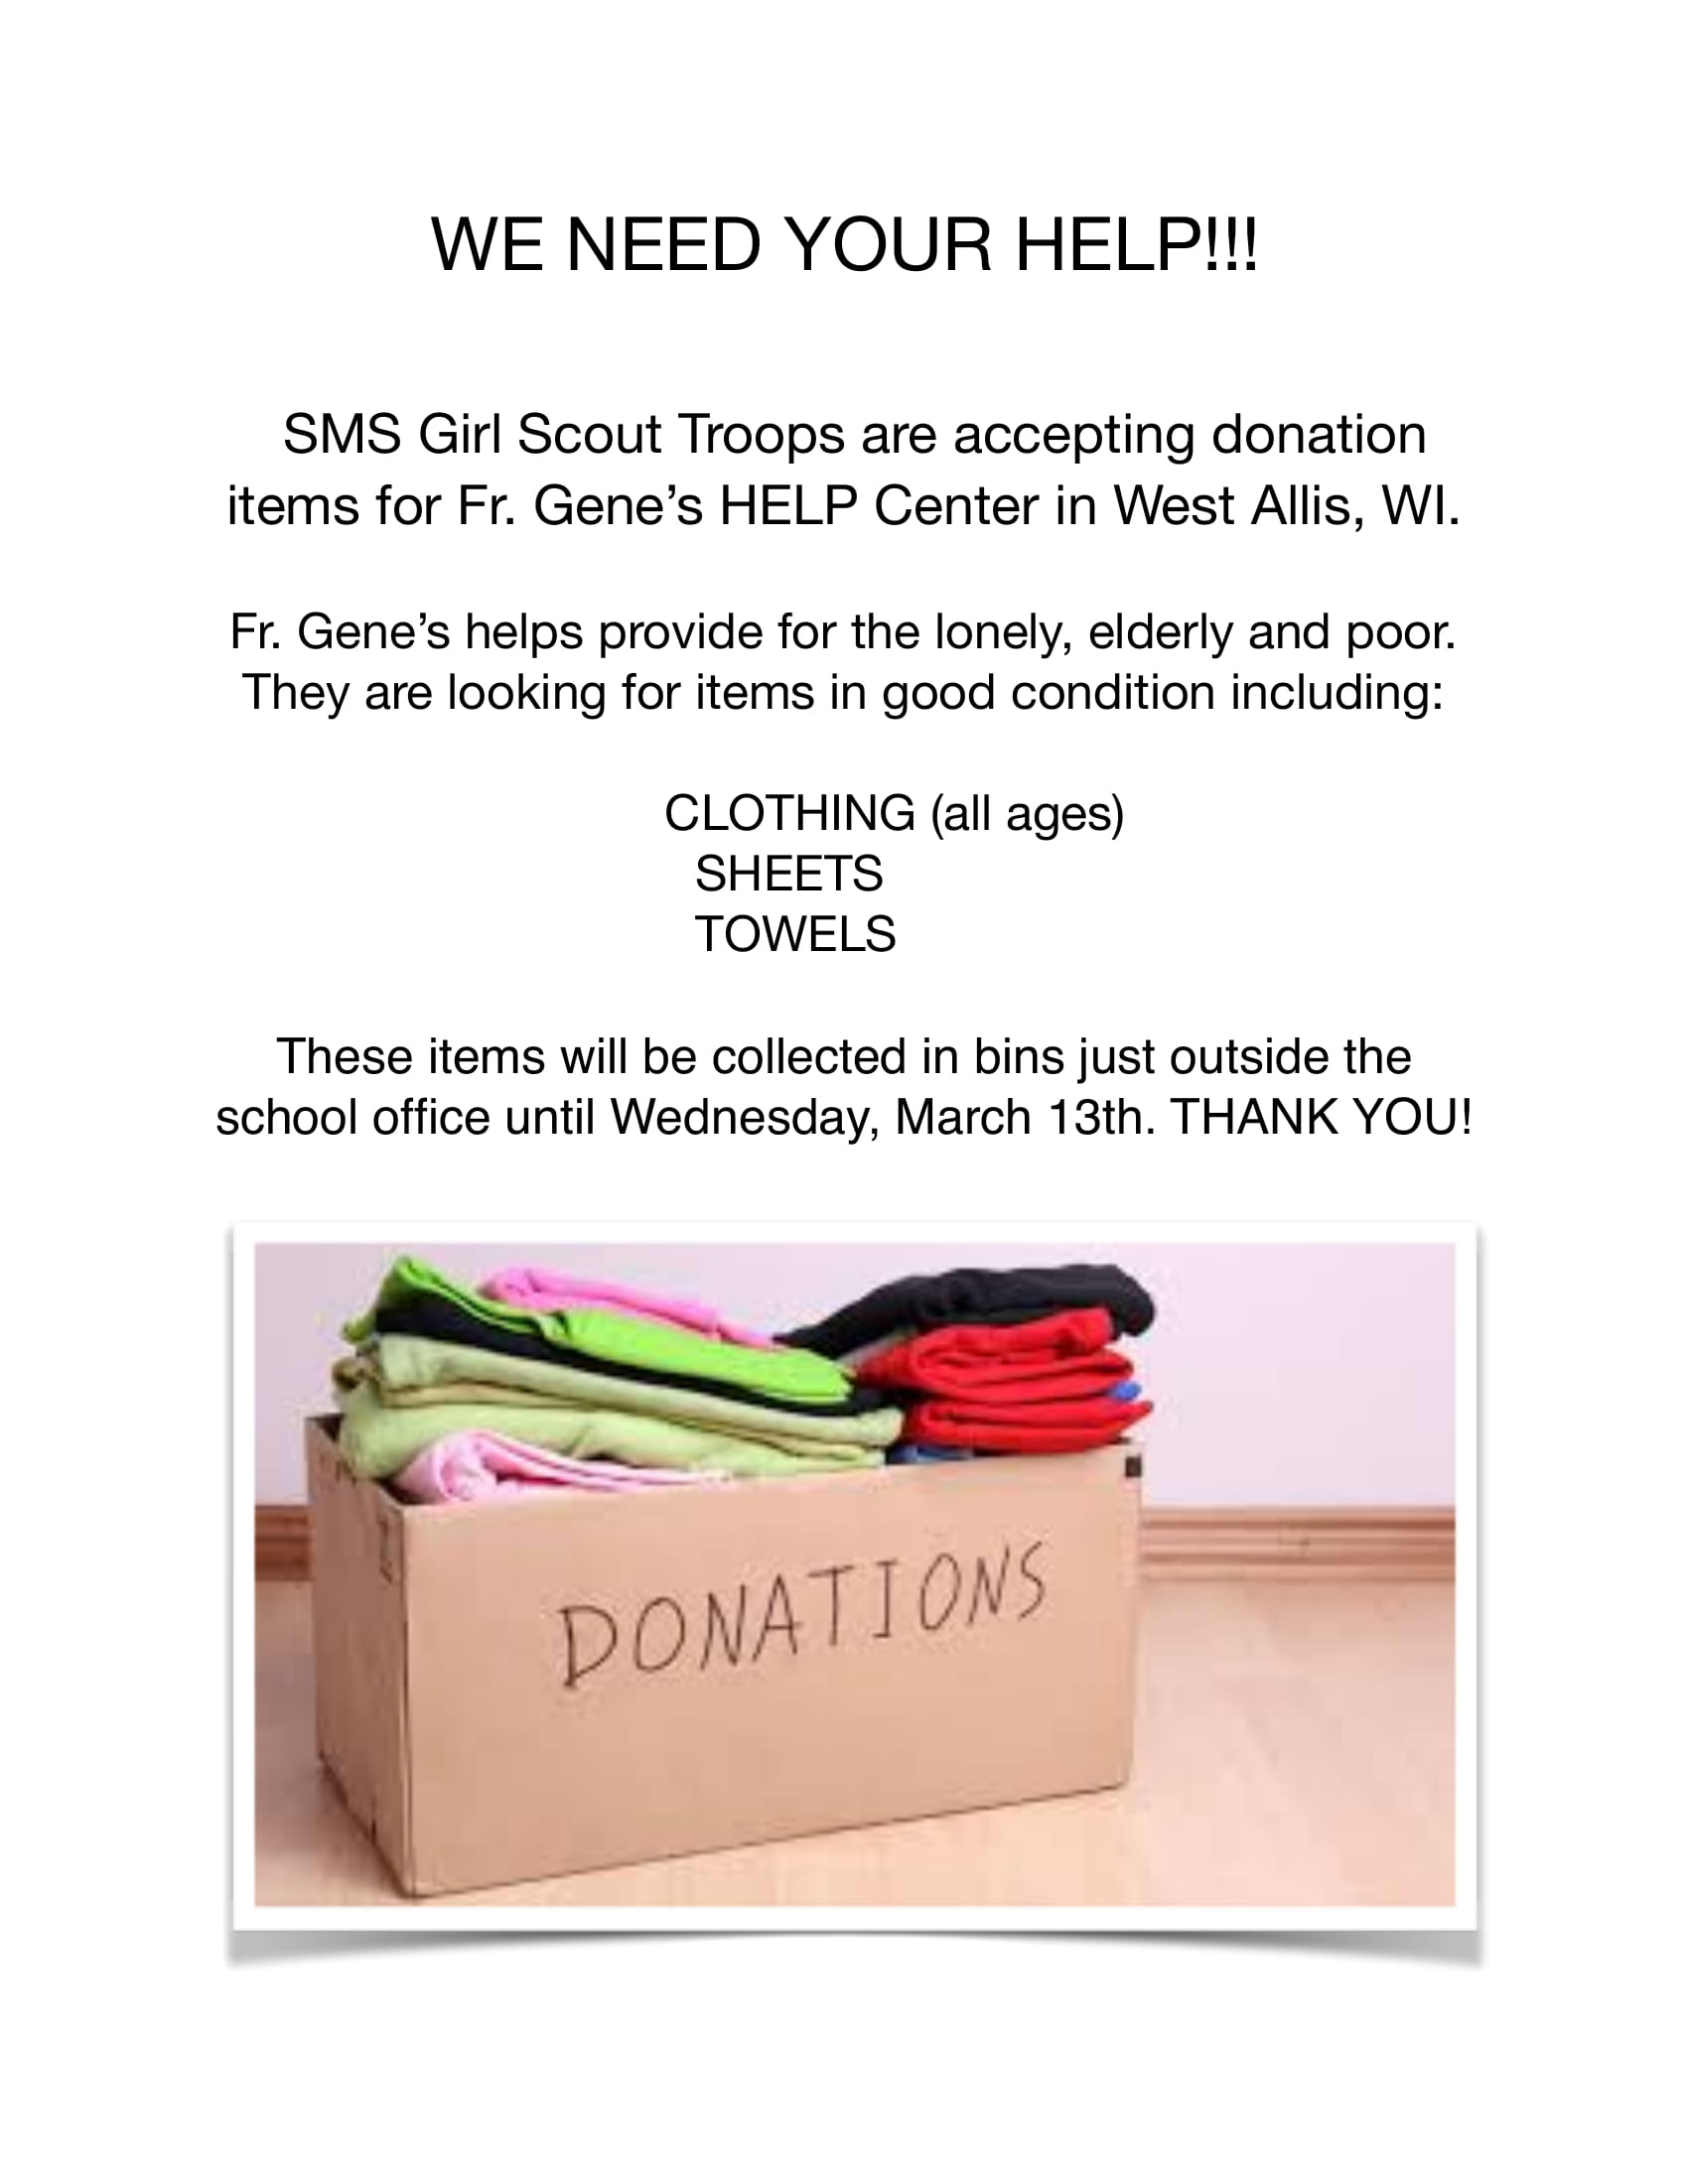 donations-1.jpg